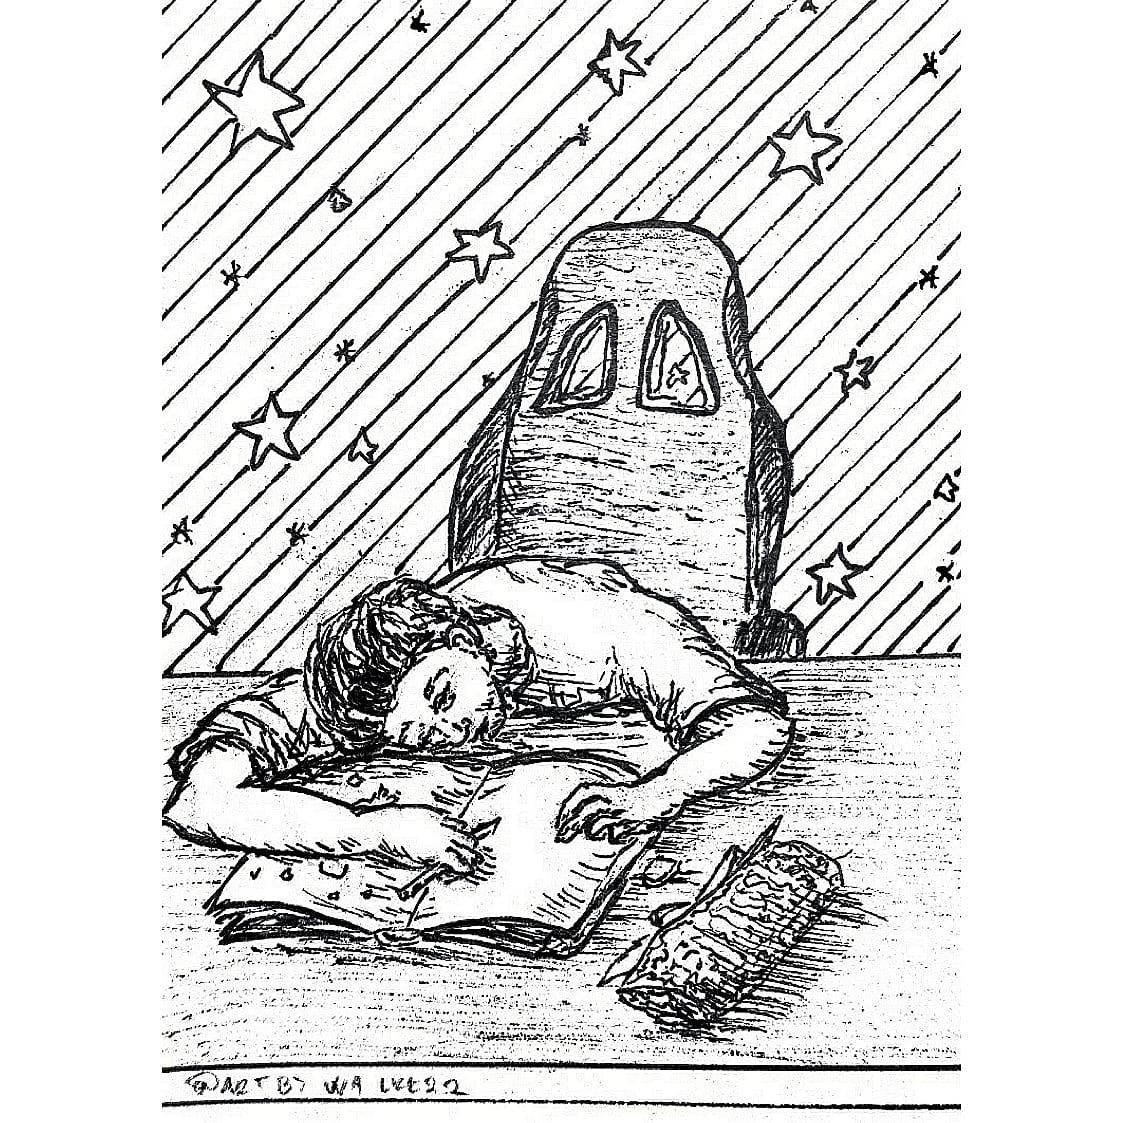 "Inktober 2020, day 21 - ""SLEEP"" . It be like that sometimes . . . . . . @inktober #inktober2020 #inktober #art #ink #illustration #drawing #draw #sketch #pencil #artwork #sleep #me #chair #table #pencilcase #sketching https://t.co/38ONdN9mmJ"